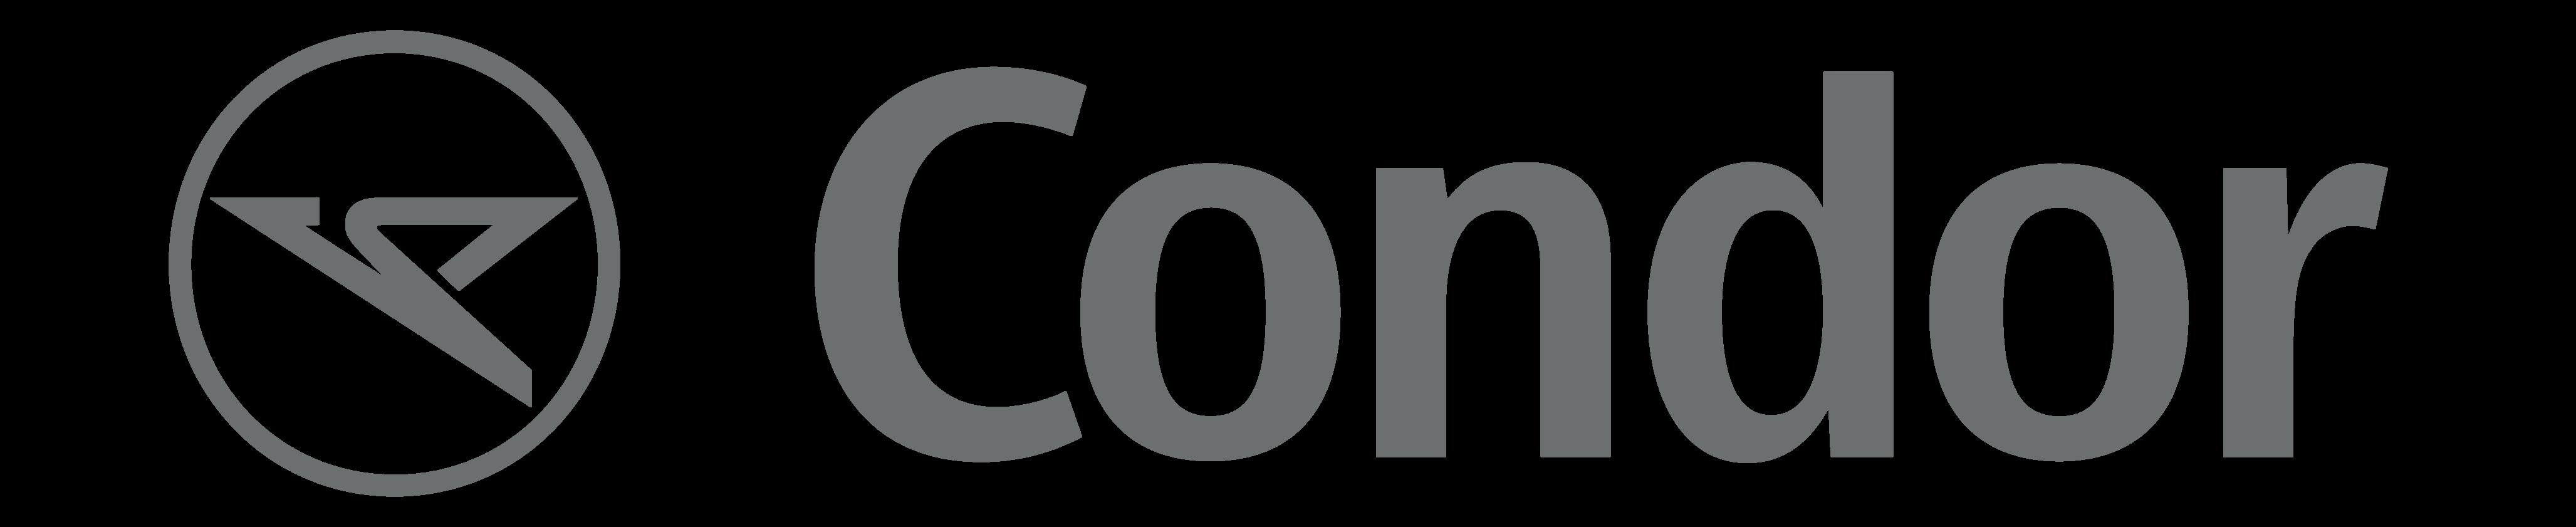 AW-Condor Airlines_Isologotype